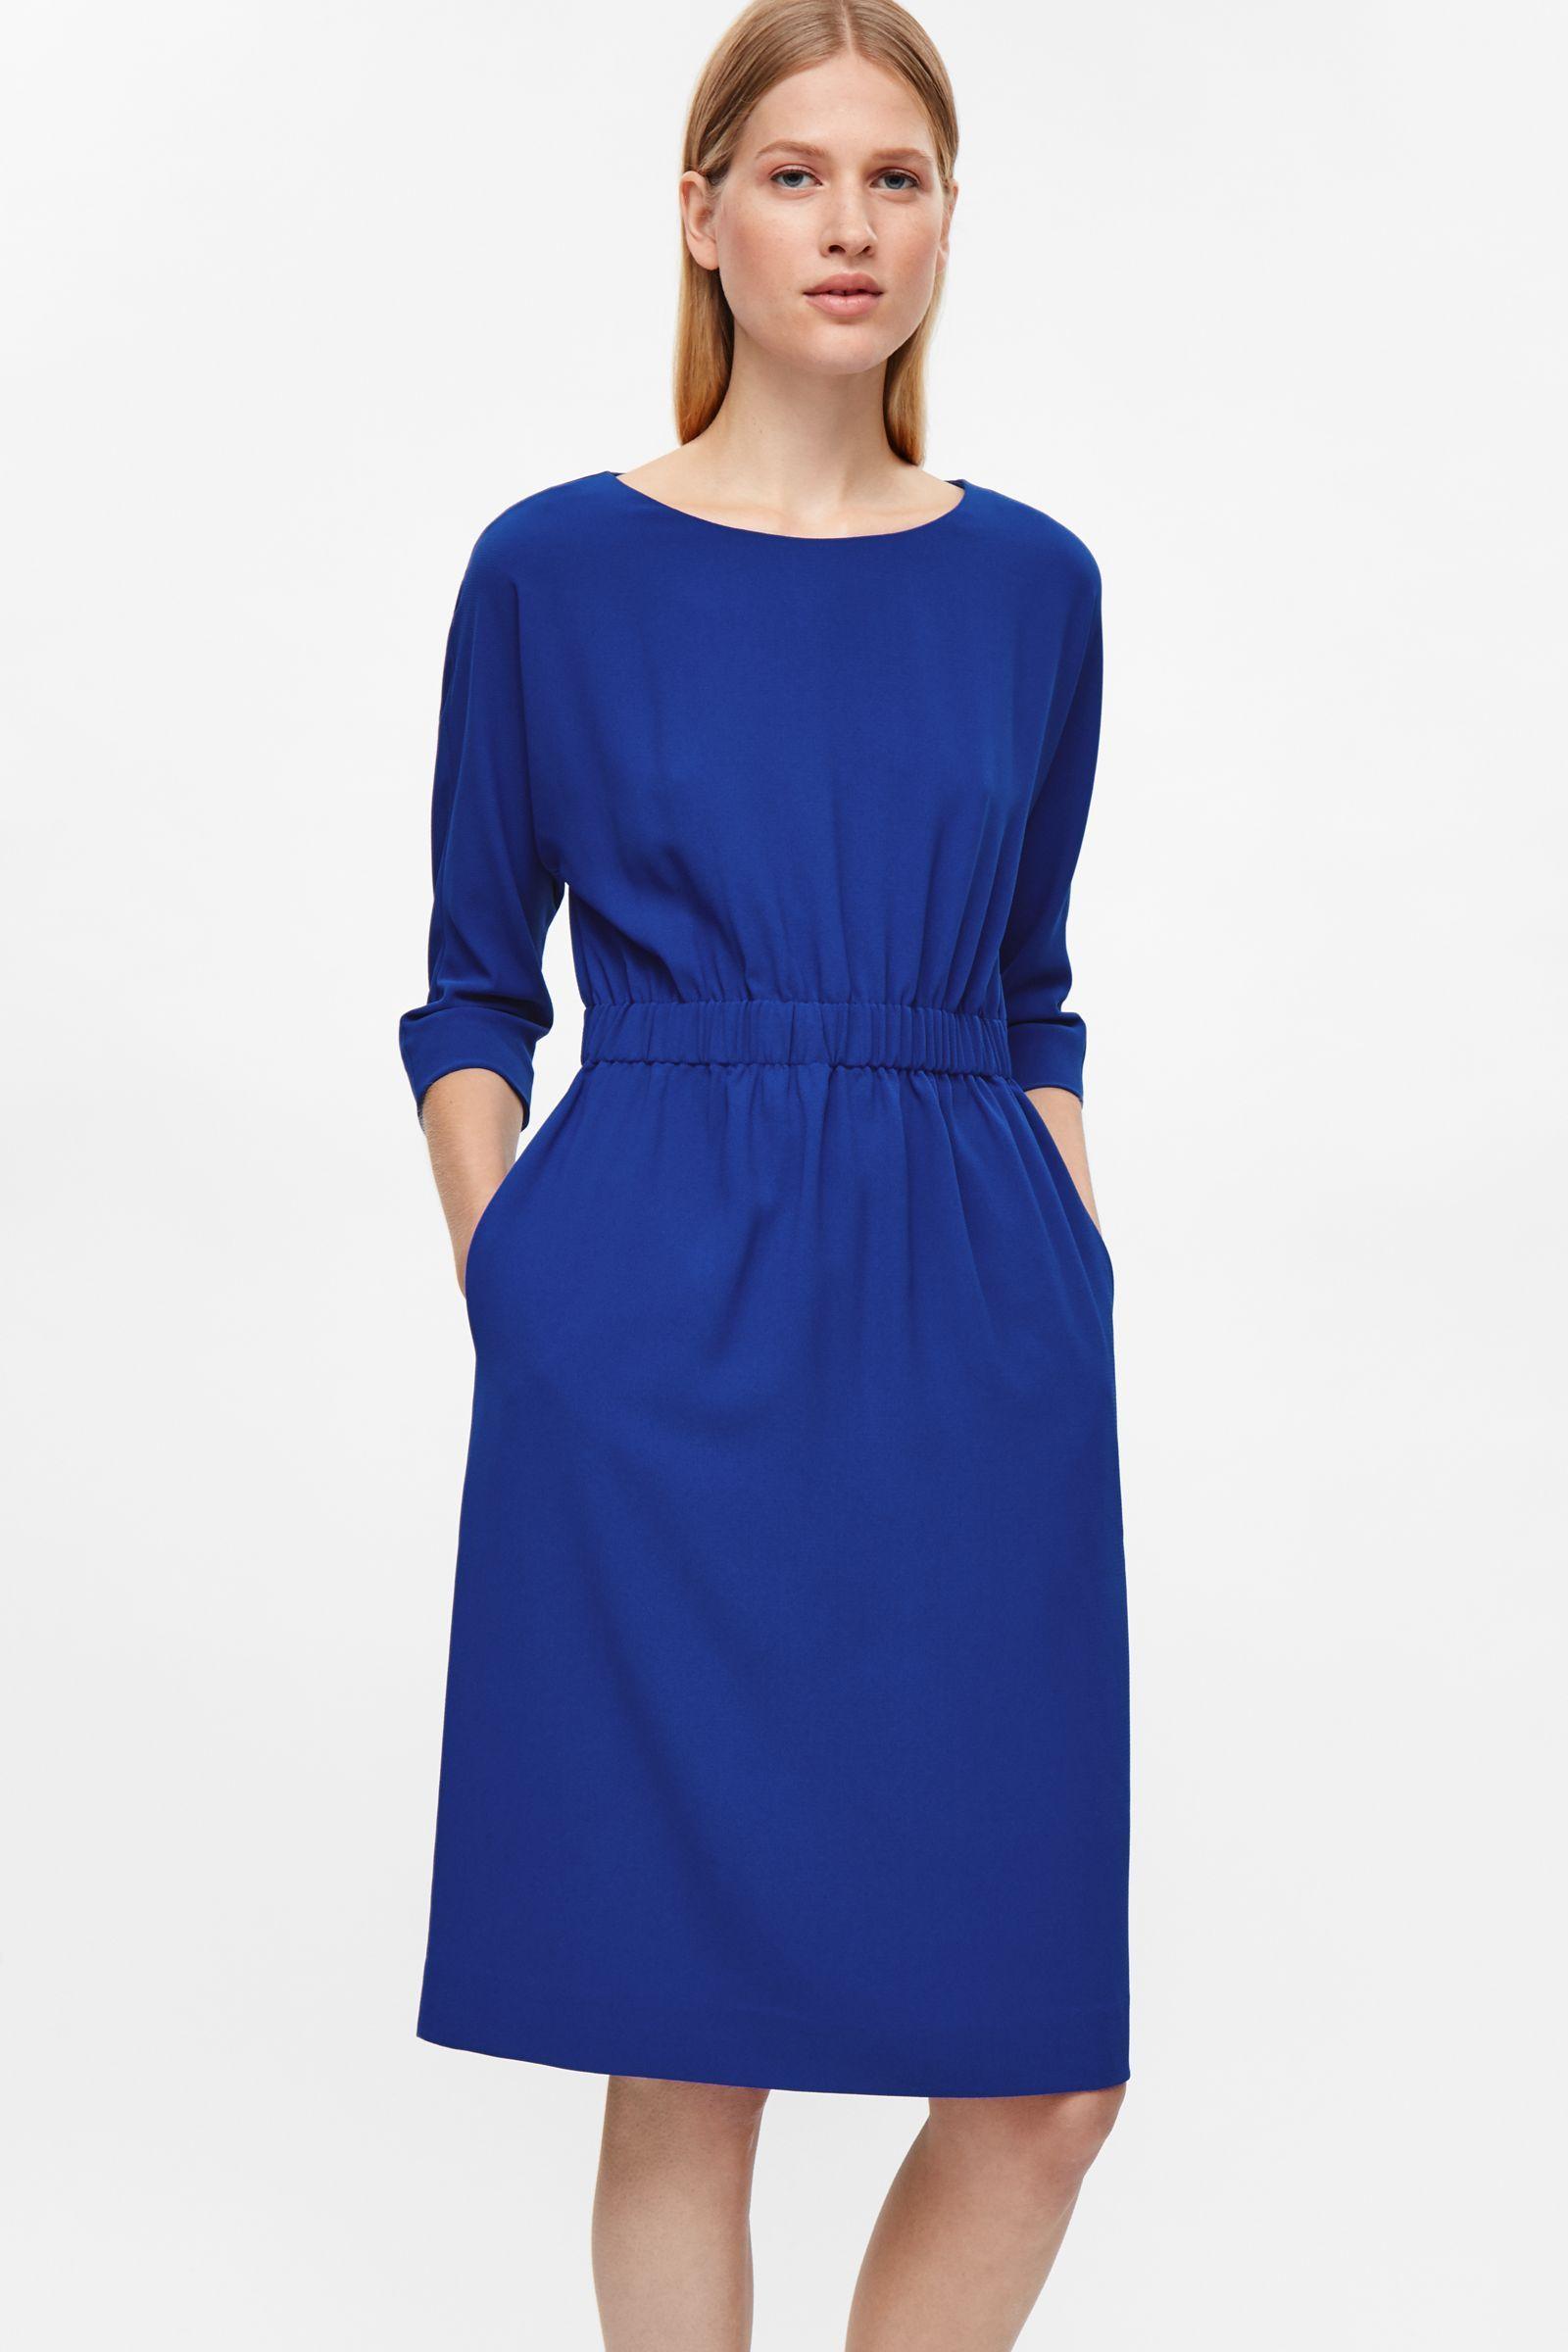 ZARA MIDIKLEID XS 34 Gestreift Kate Middleton Midi Dress Blau Weiss